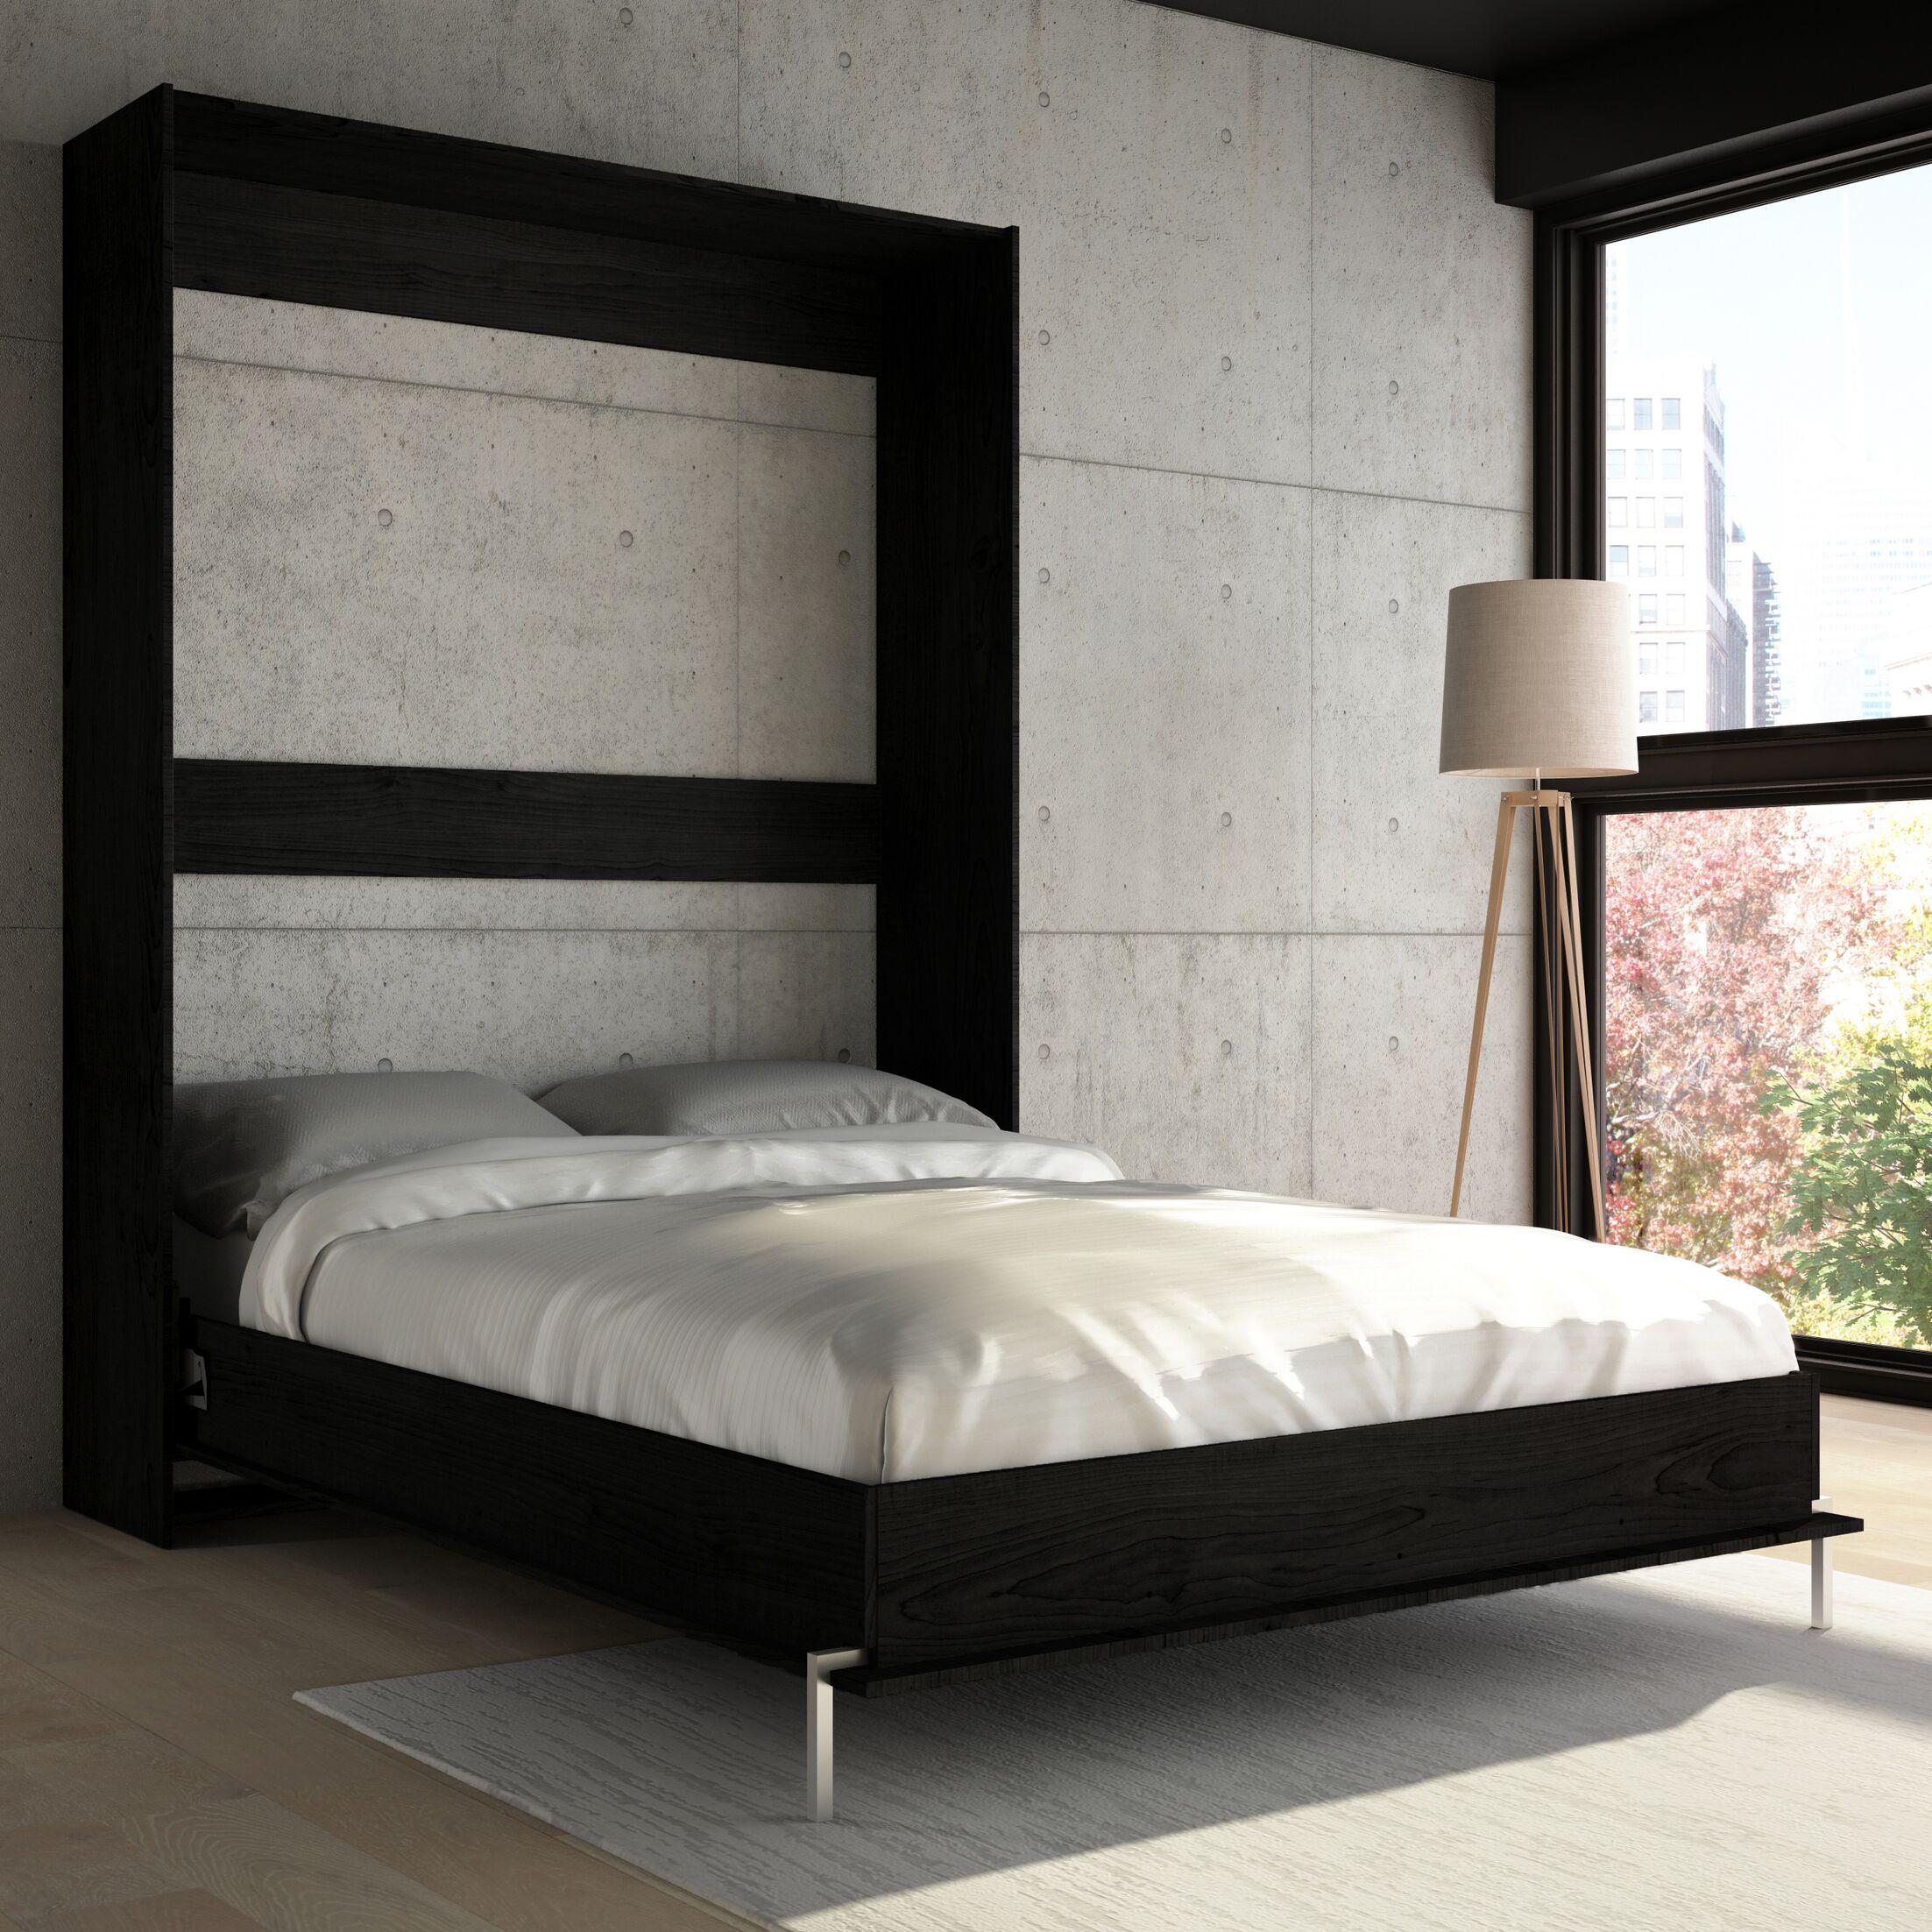 Lower Weston Murphy Bed Size: Full, Color: Black Wood Grain